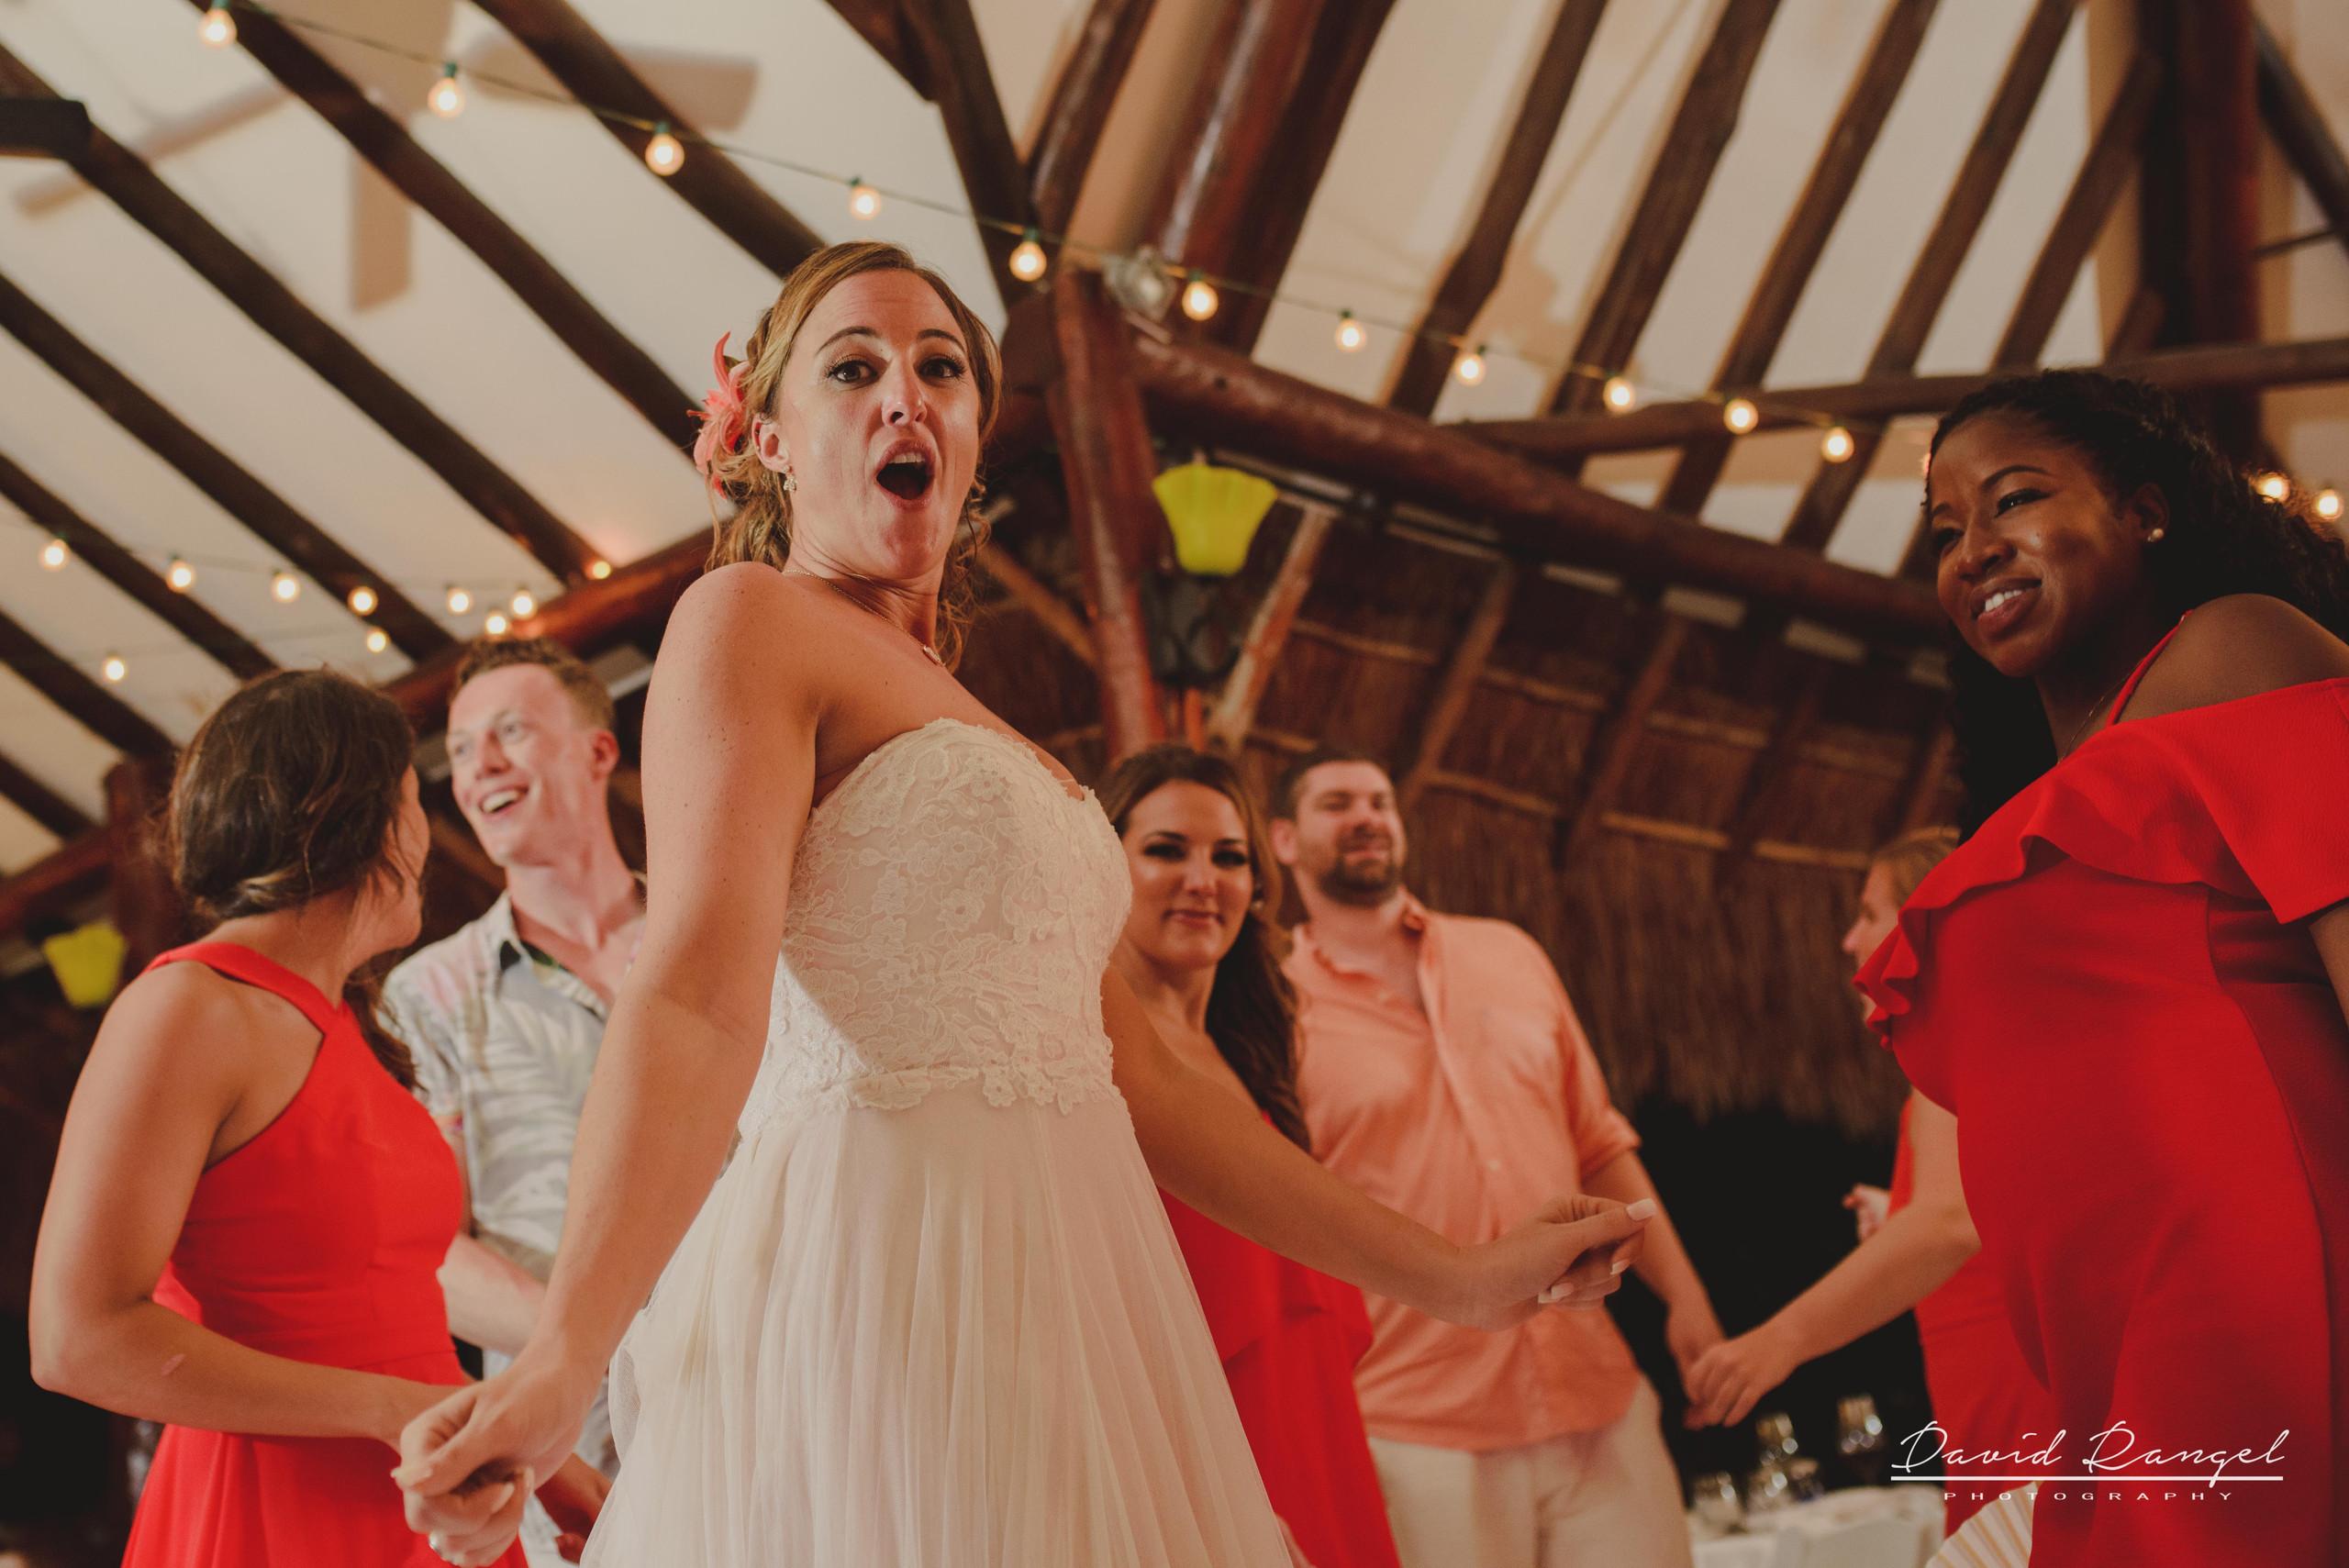 bride+dance+bridesmaids+happy+funny+best+friends